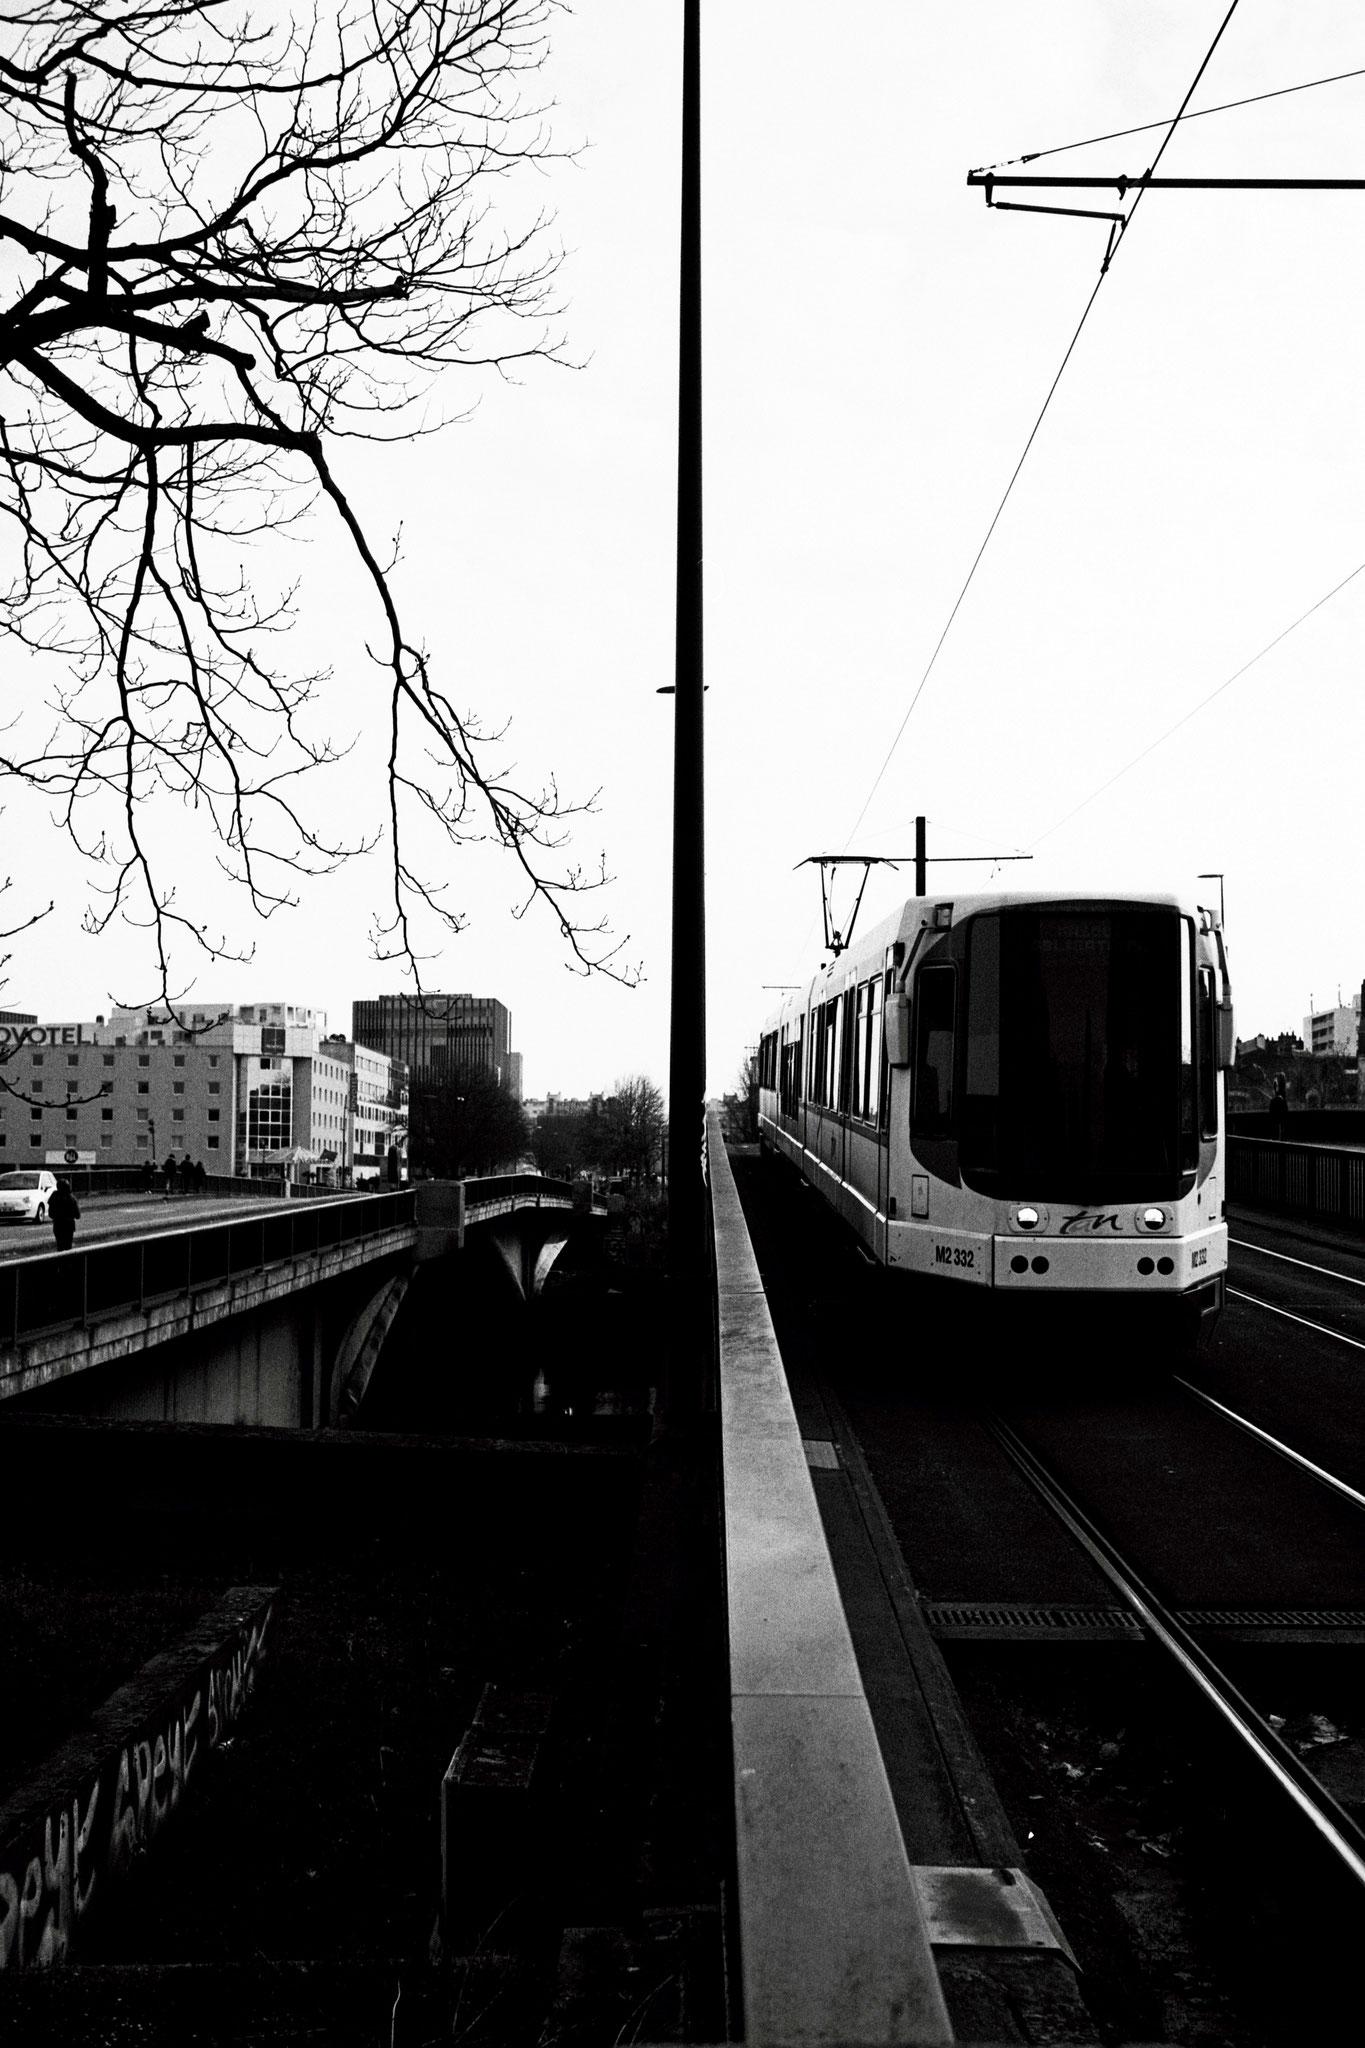 """Driving on the bridge"" - Pont Général Audibert, Nantes (2021). Rollei Blackbird Creative 64 ASA. © Clémence Rougetet"